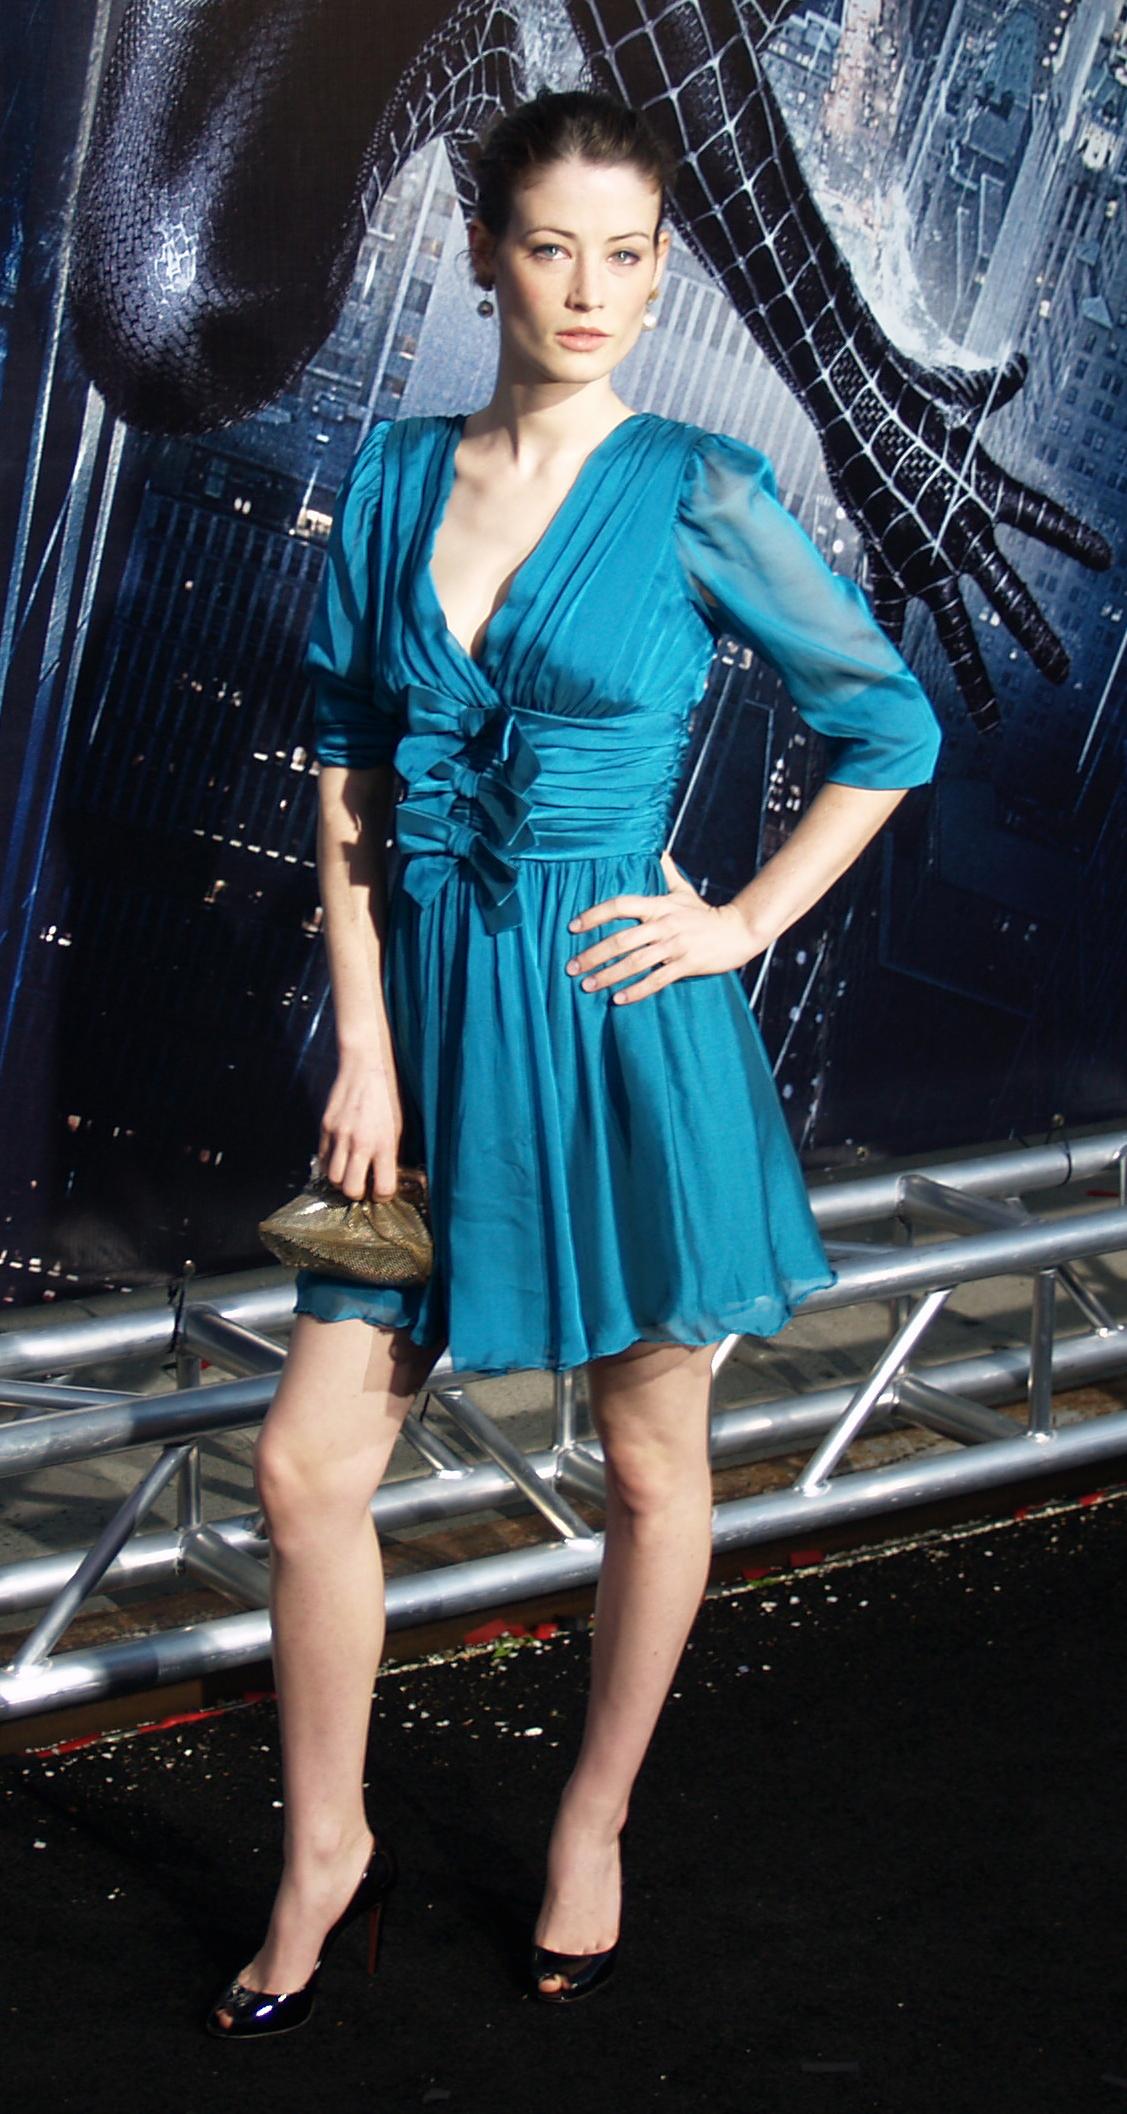 Lucy Gordon en mini-robe décolletée